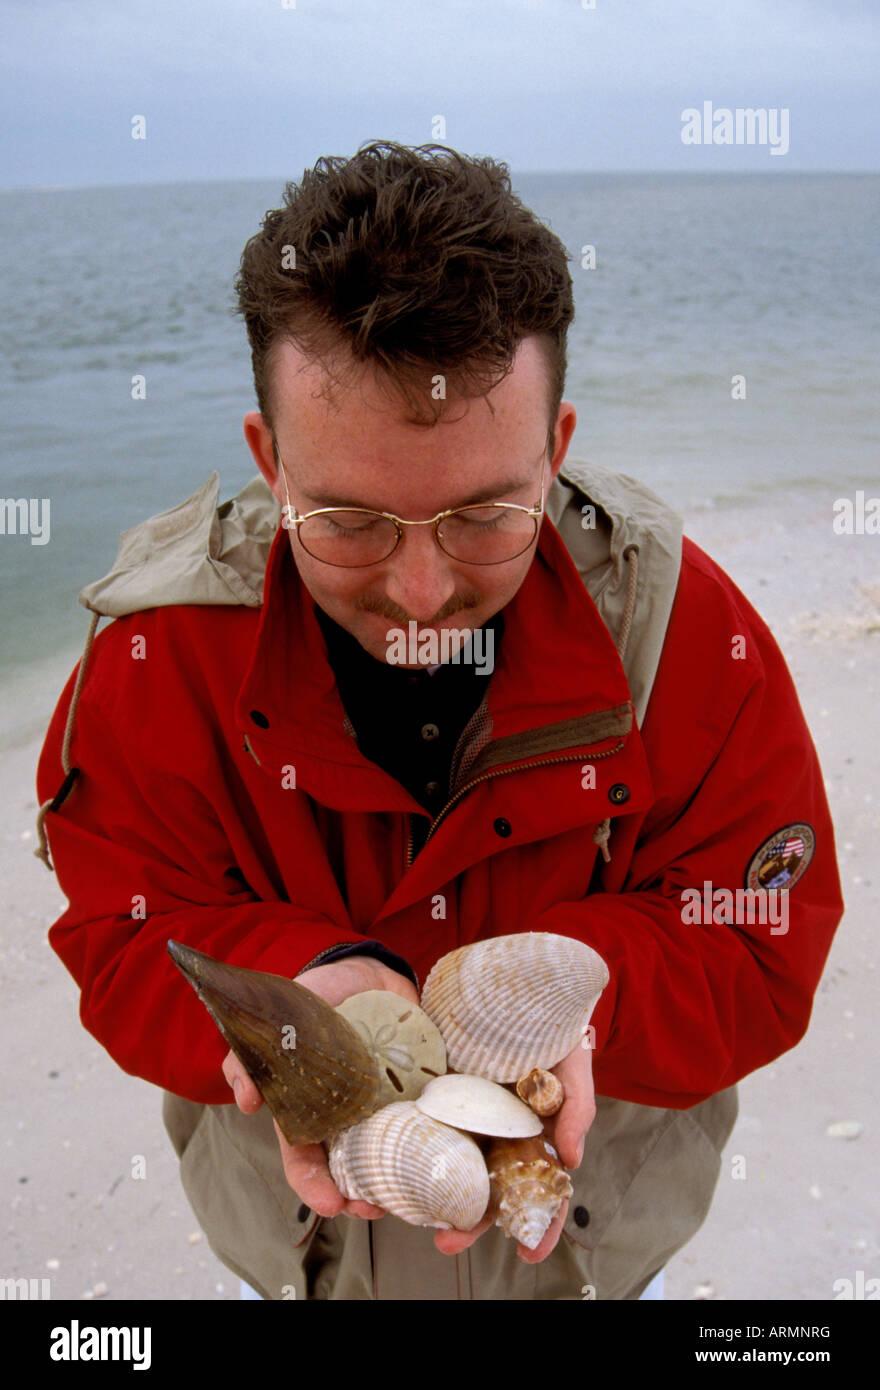 FL Florida Everglades National Park Seashore beach shelling near ...